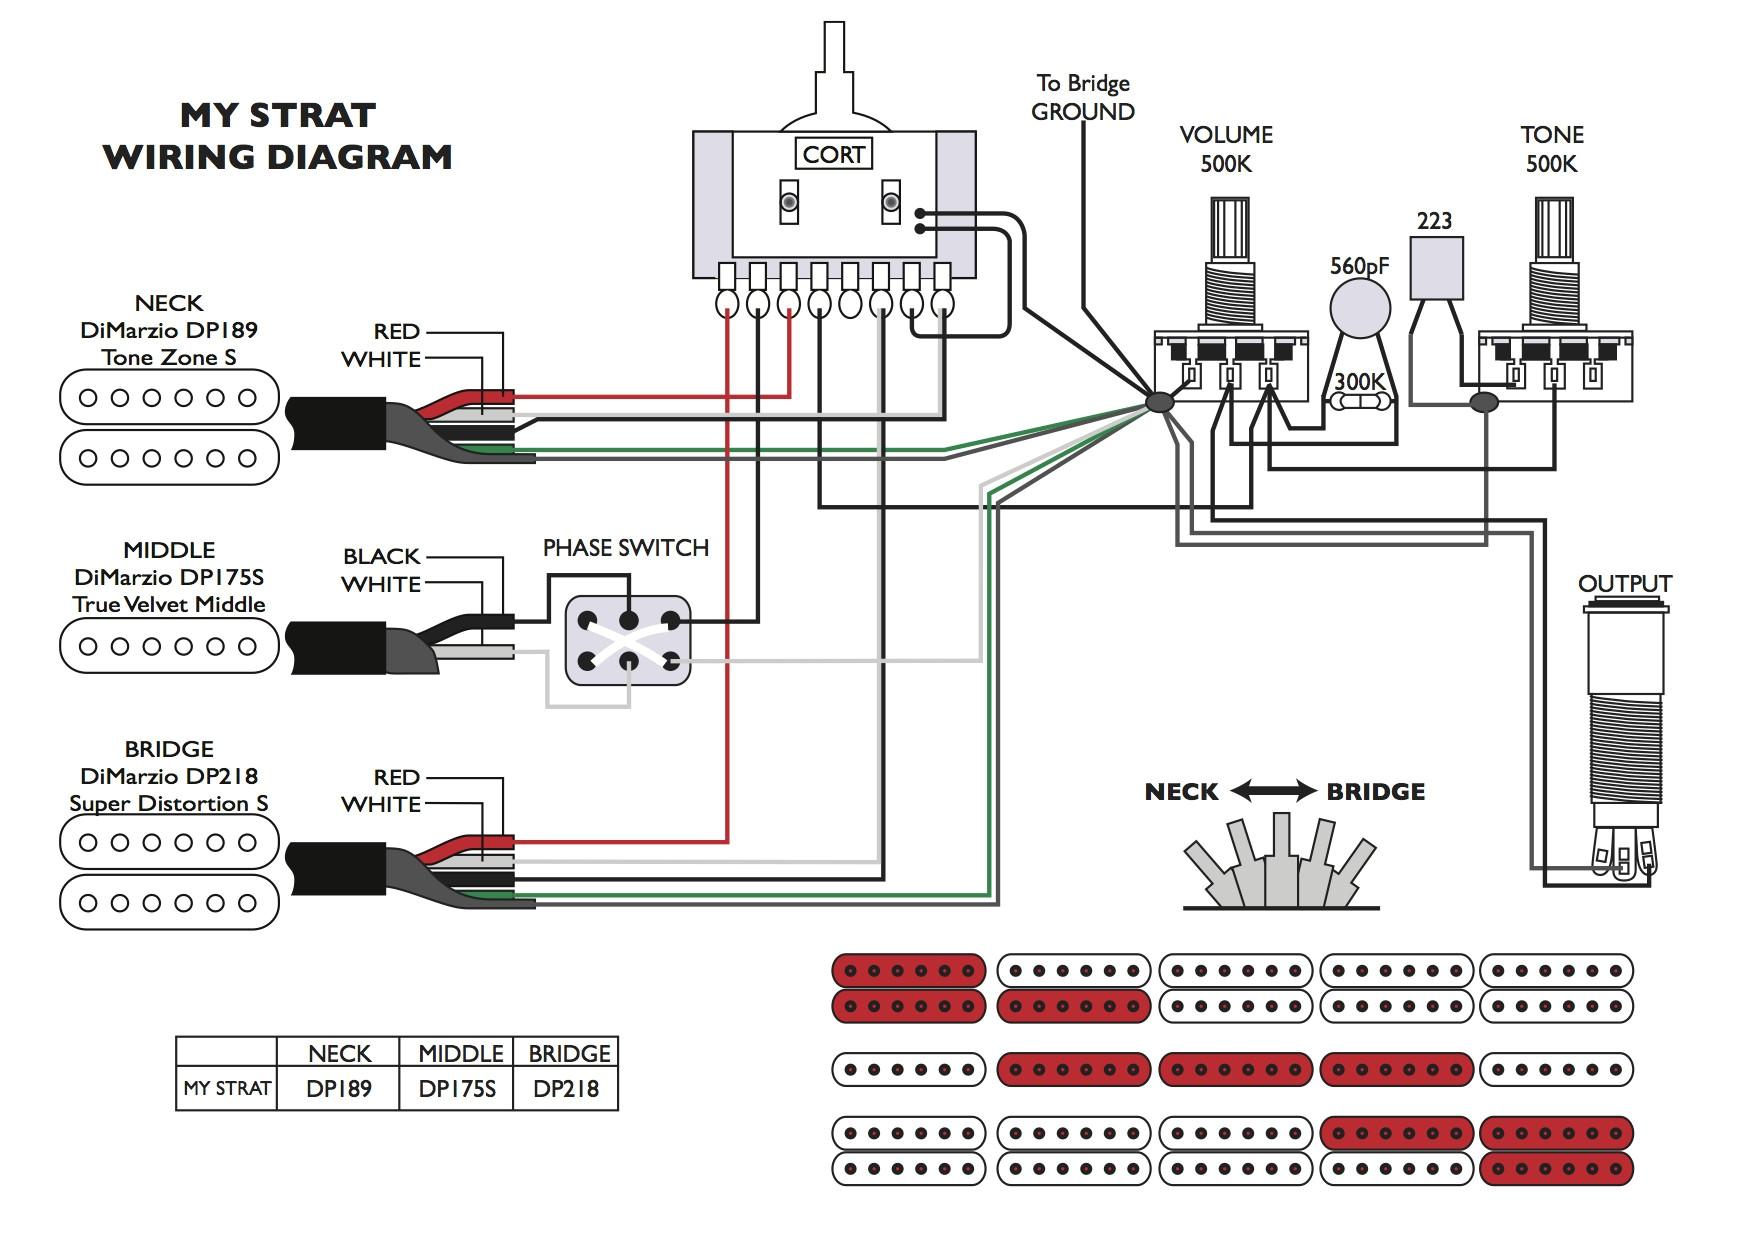 joe satriani wiring diagram wiring diagrams konsult ibanez wiring diagrams wiring diagram used joe satriani wiring